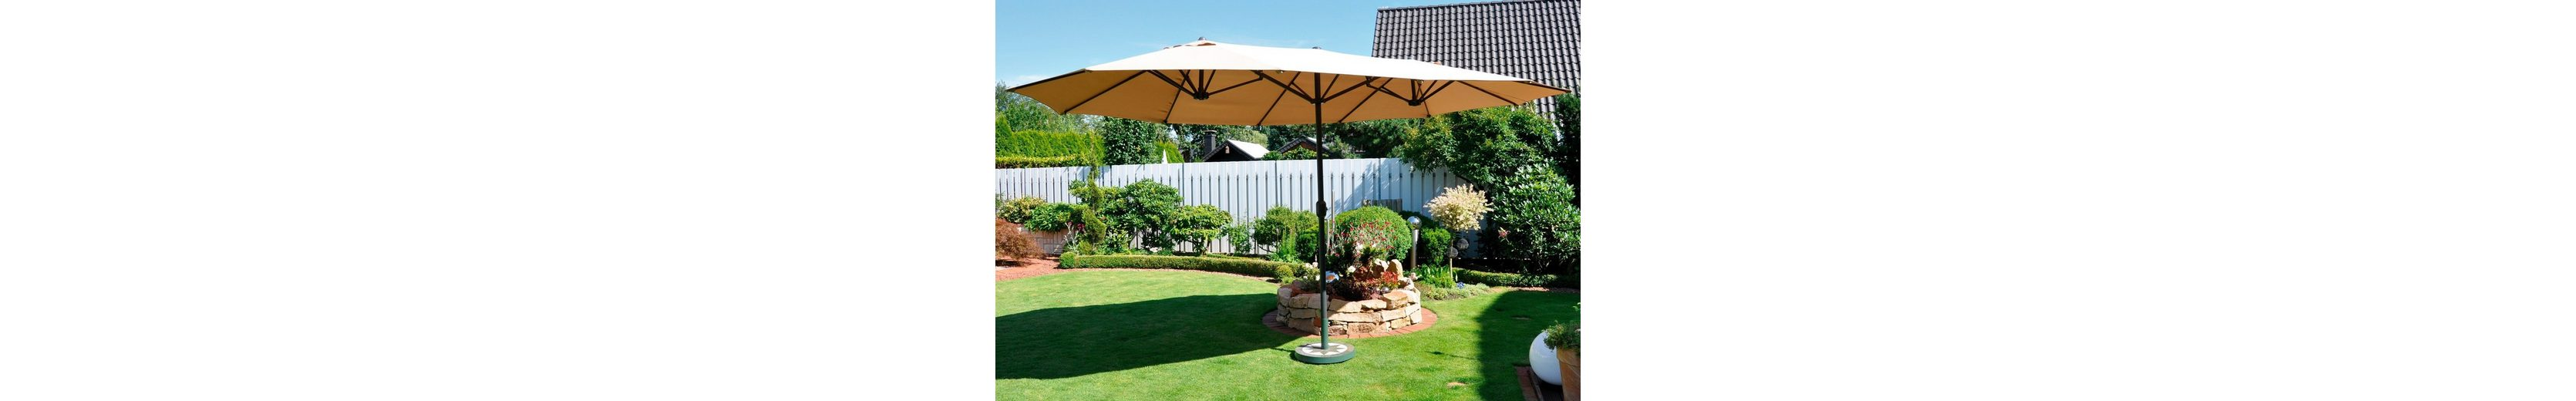 Sonnenschirm »Oval«